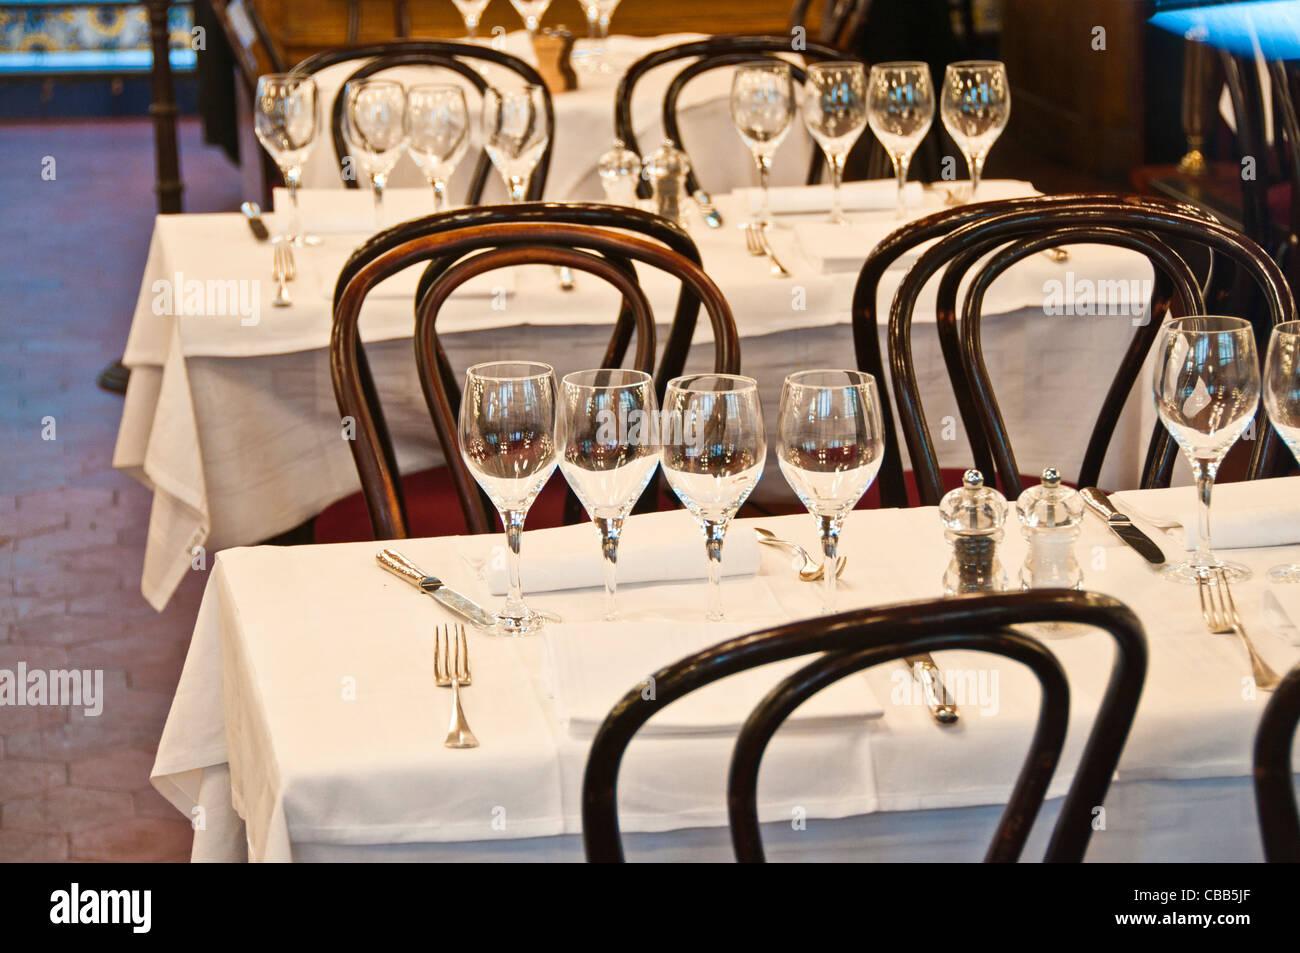 Mesa de comedor lugar ajustes Imagen De Stock